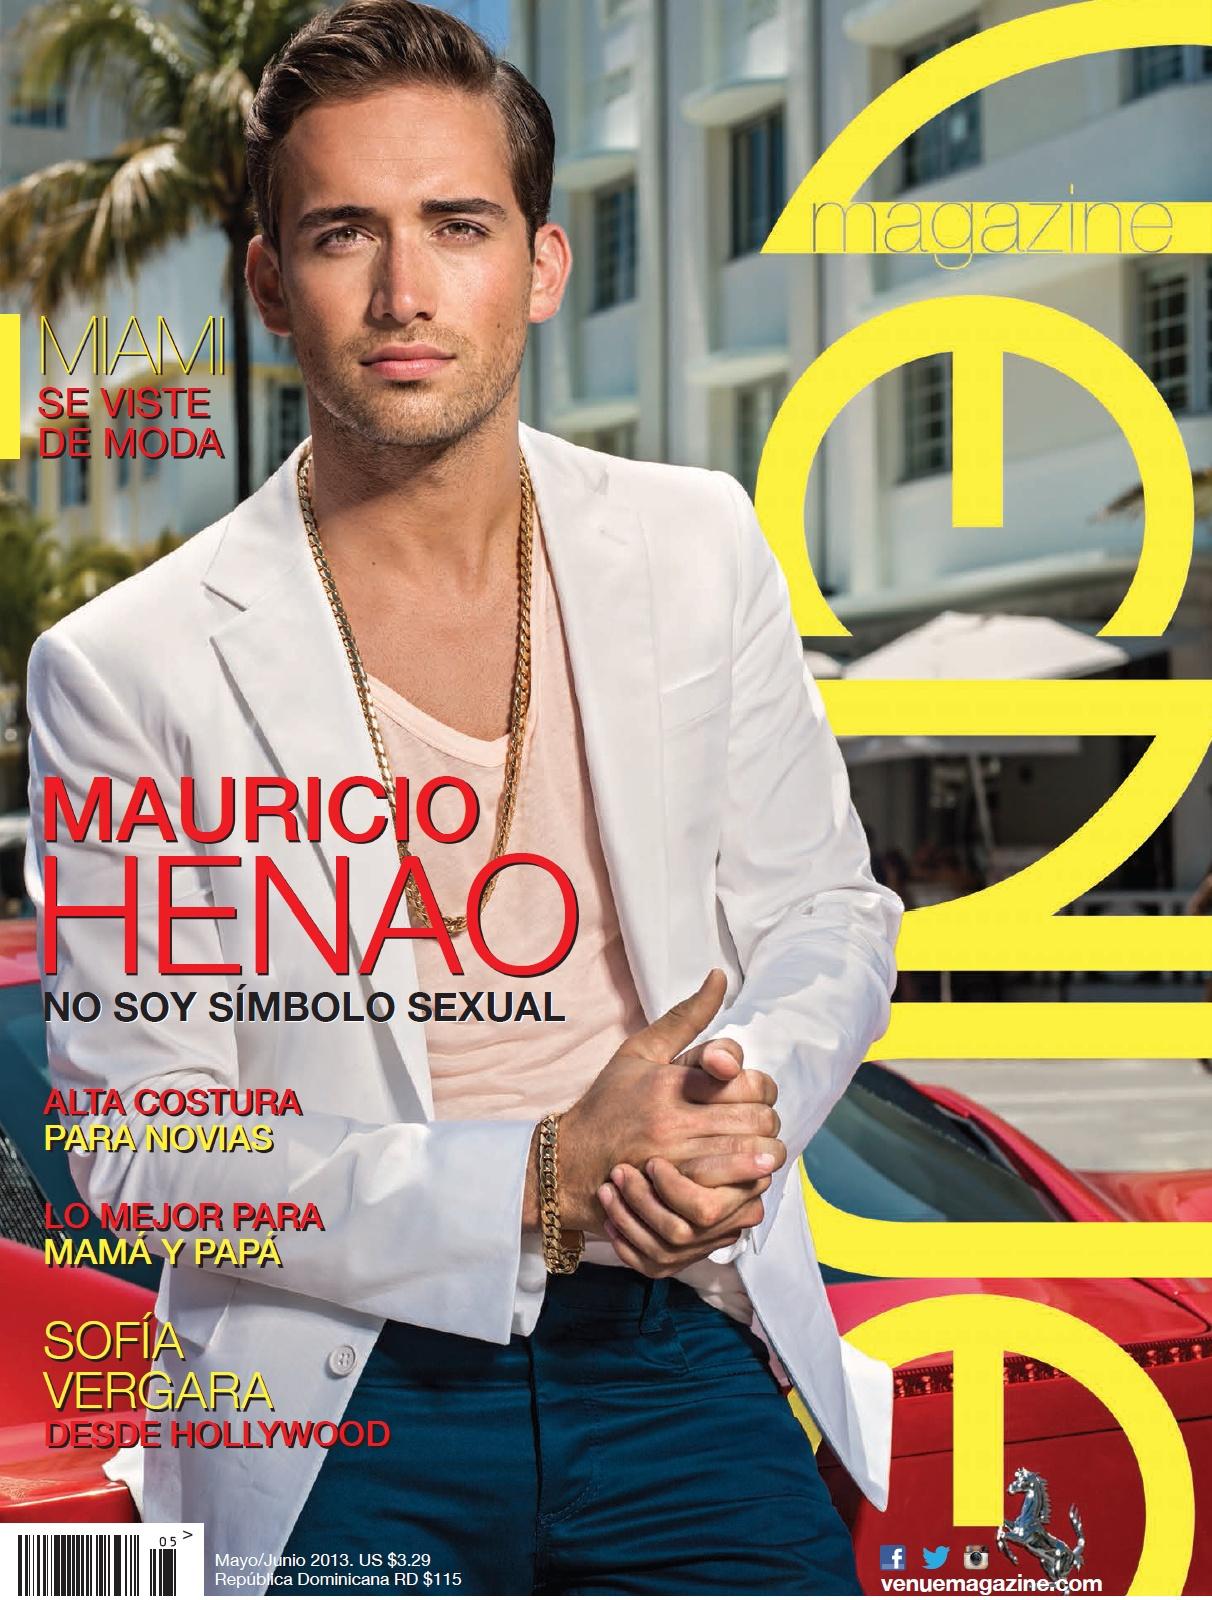 Mauricio Henao/მაურისიო ენაო - Page 2 91a295b8b32965a75e7c3212ca7830c9